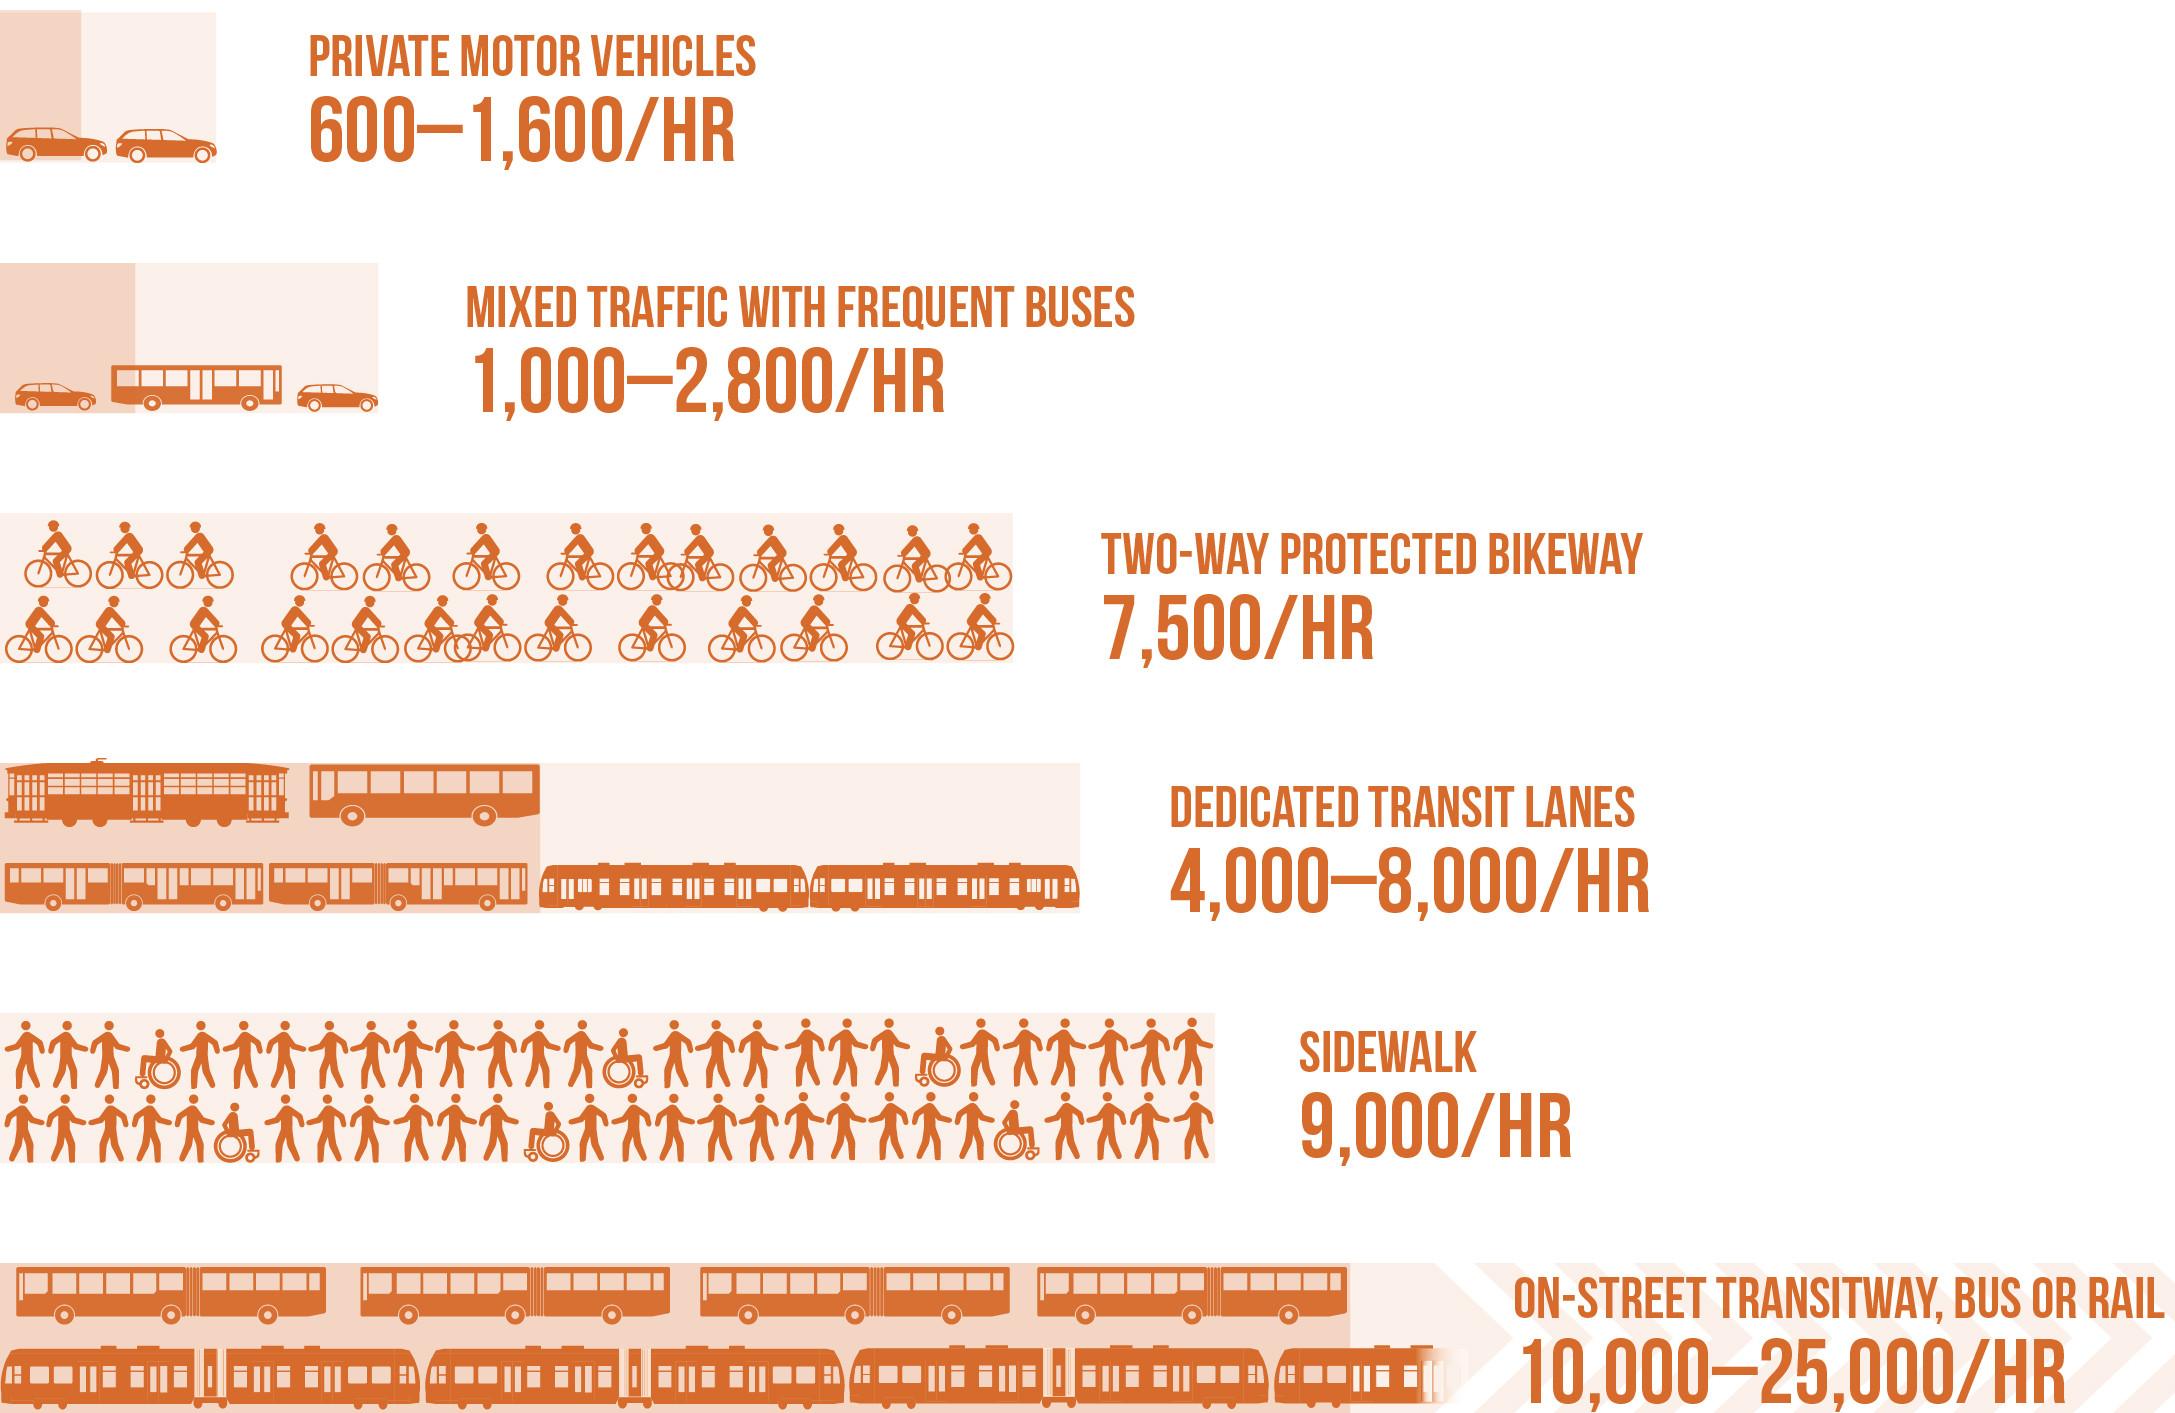 Picture Credit: National Association of City Transportation Officials -Transit Street Design Guide